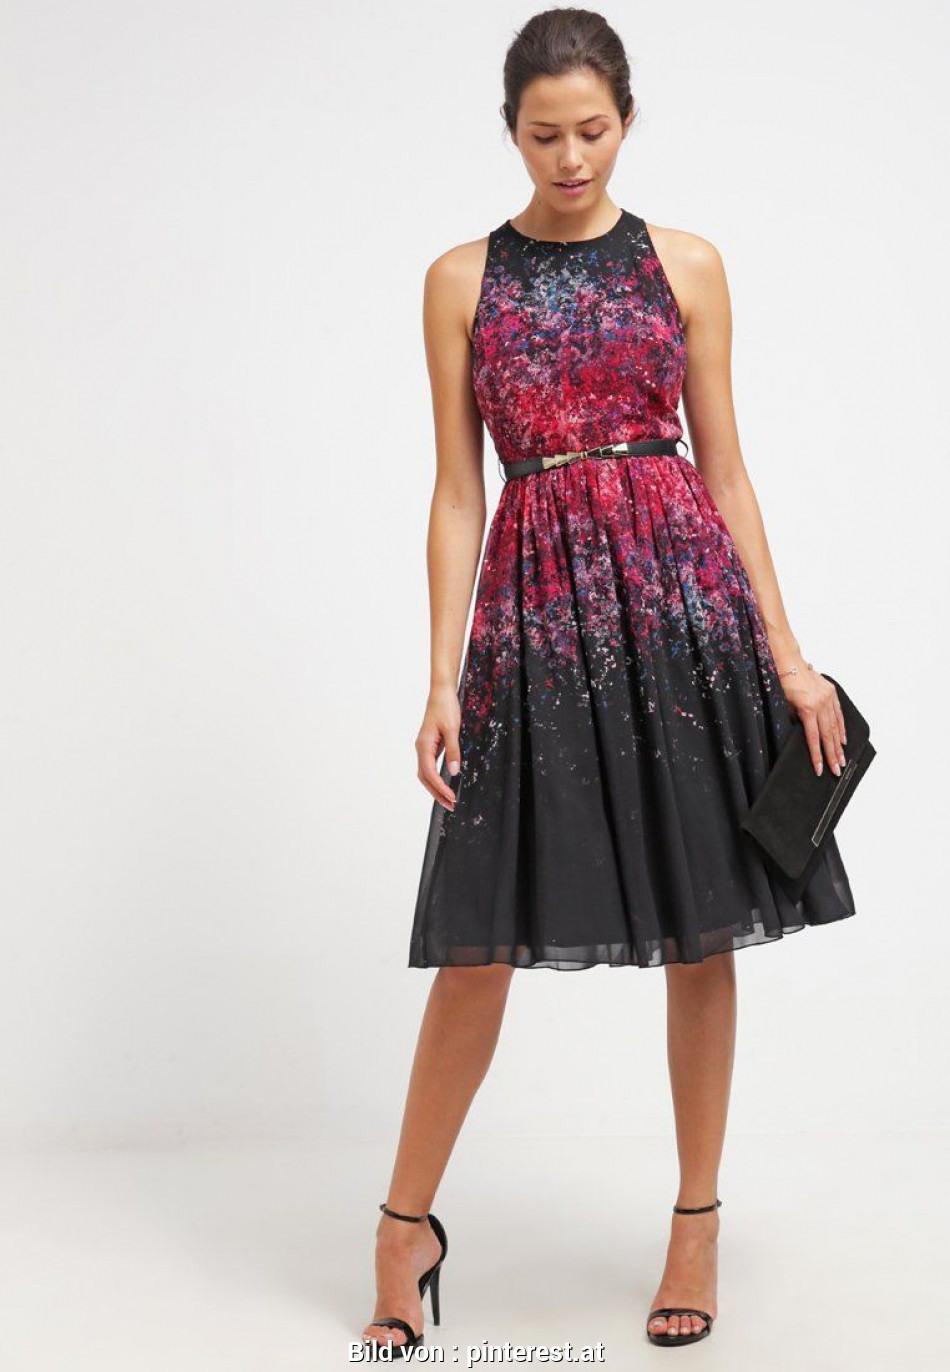 Formal Top Zalando Abendkleider DesignFormal Luxurius Zalando Abendkleider Vertrieb